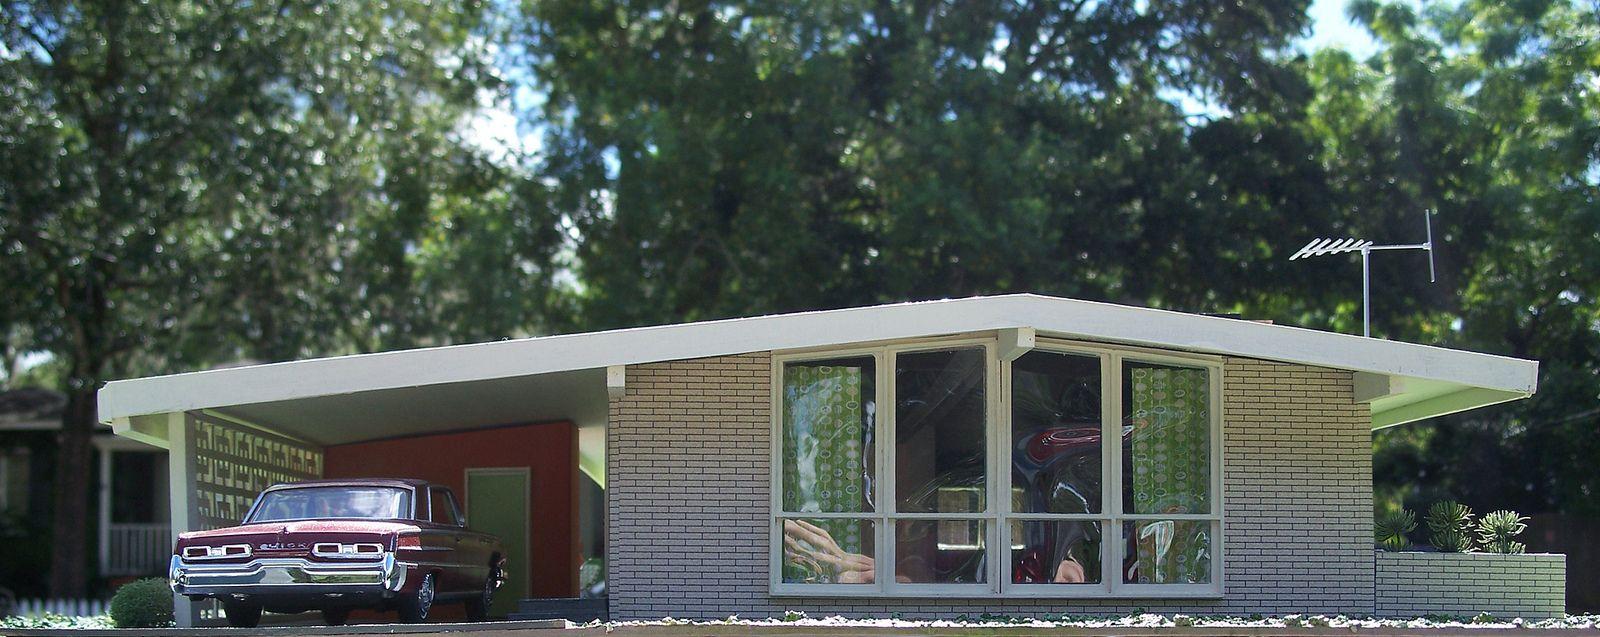 California post war suburban home architecture design for Post modern house